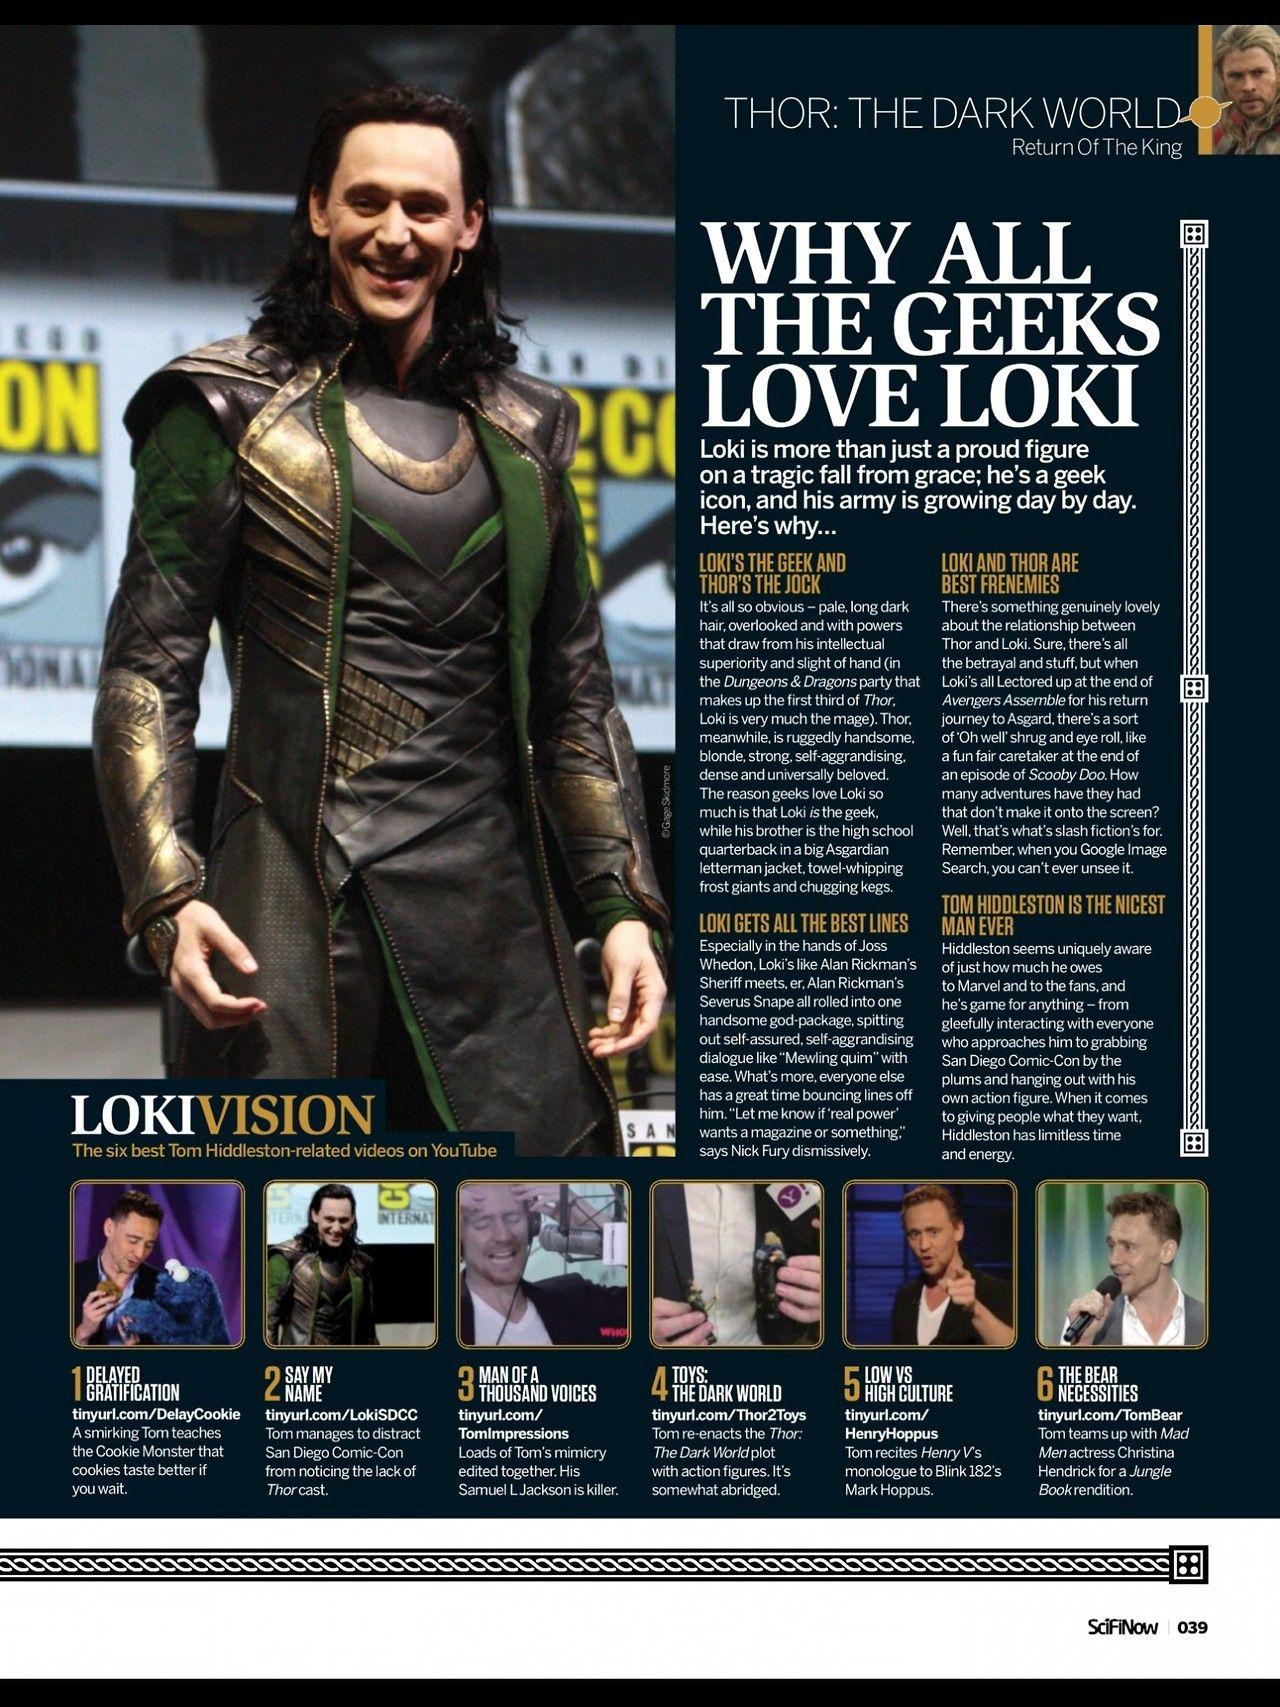 loki, loki's army, loki of asgard, loki laufeyson, loki of jotunheim, geek, nerd, jock